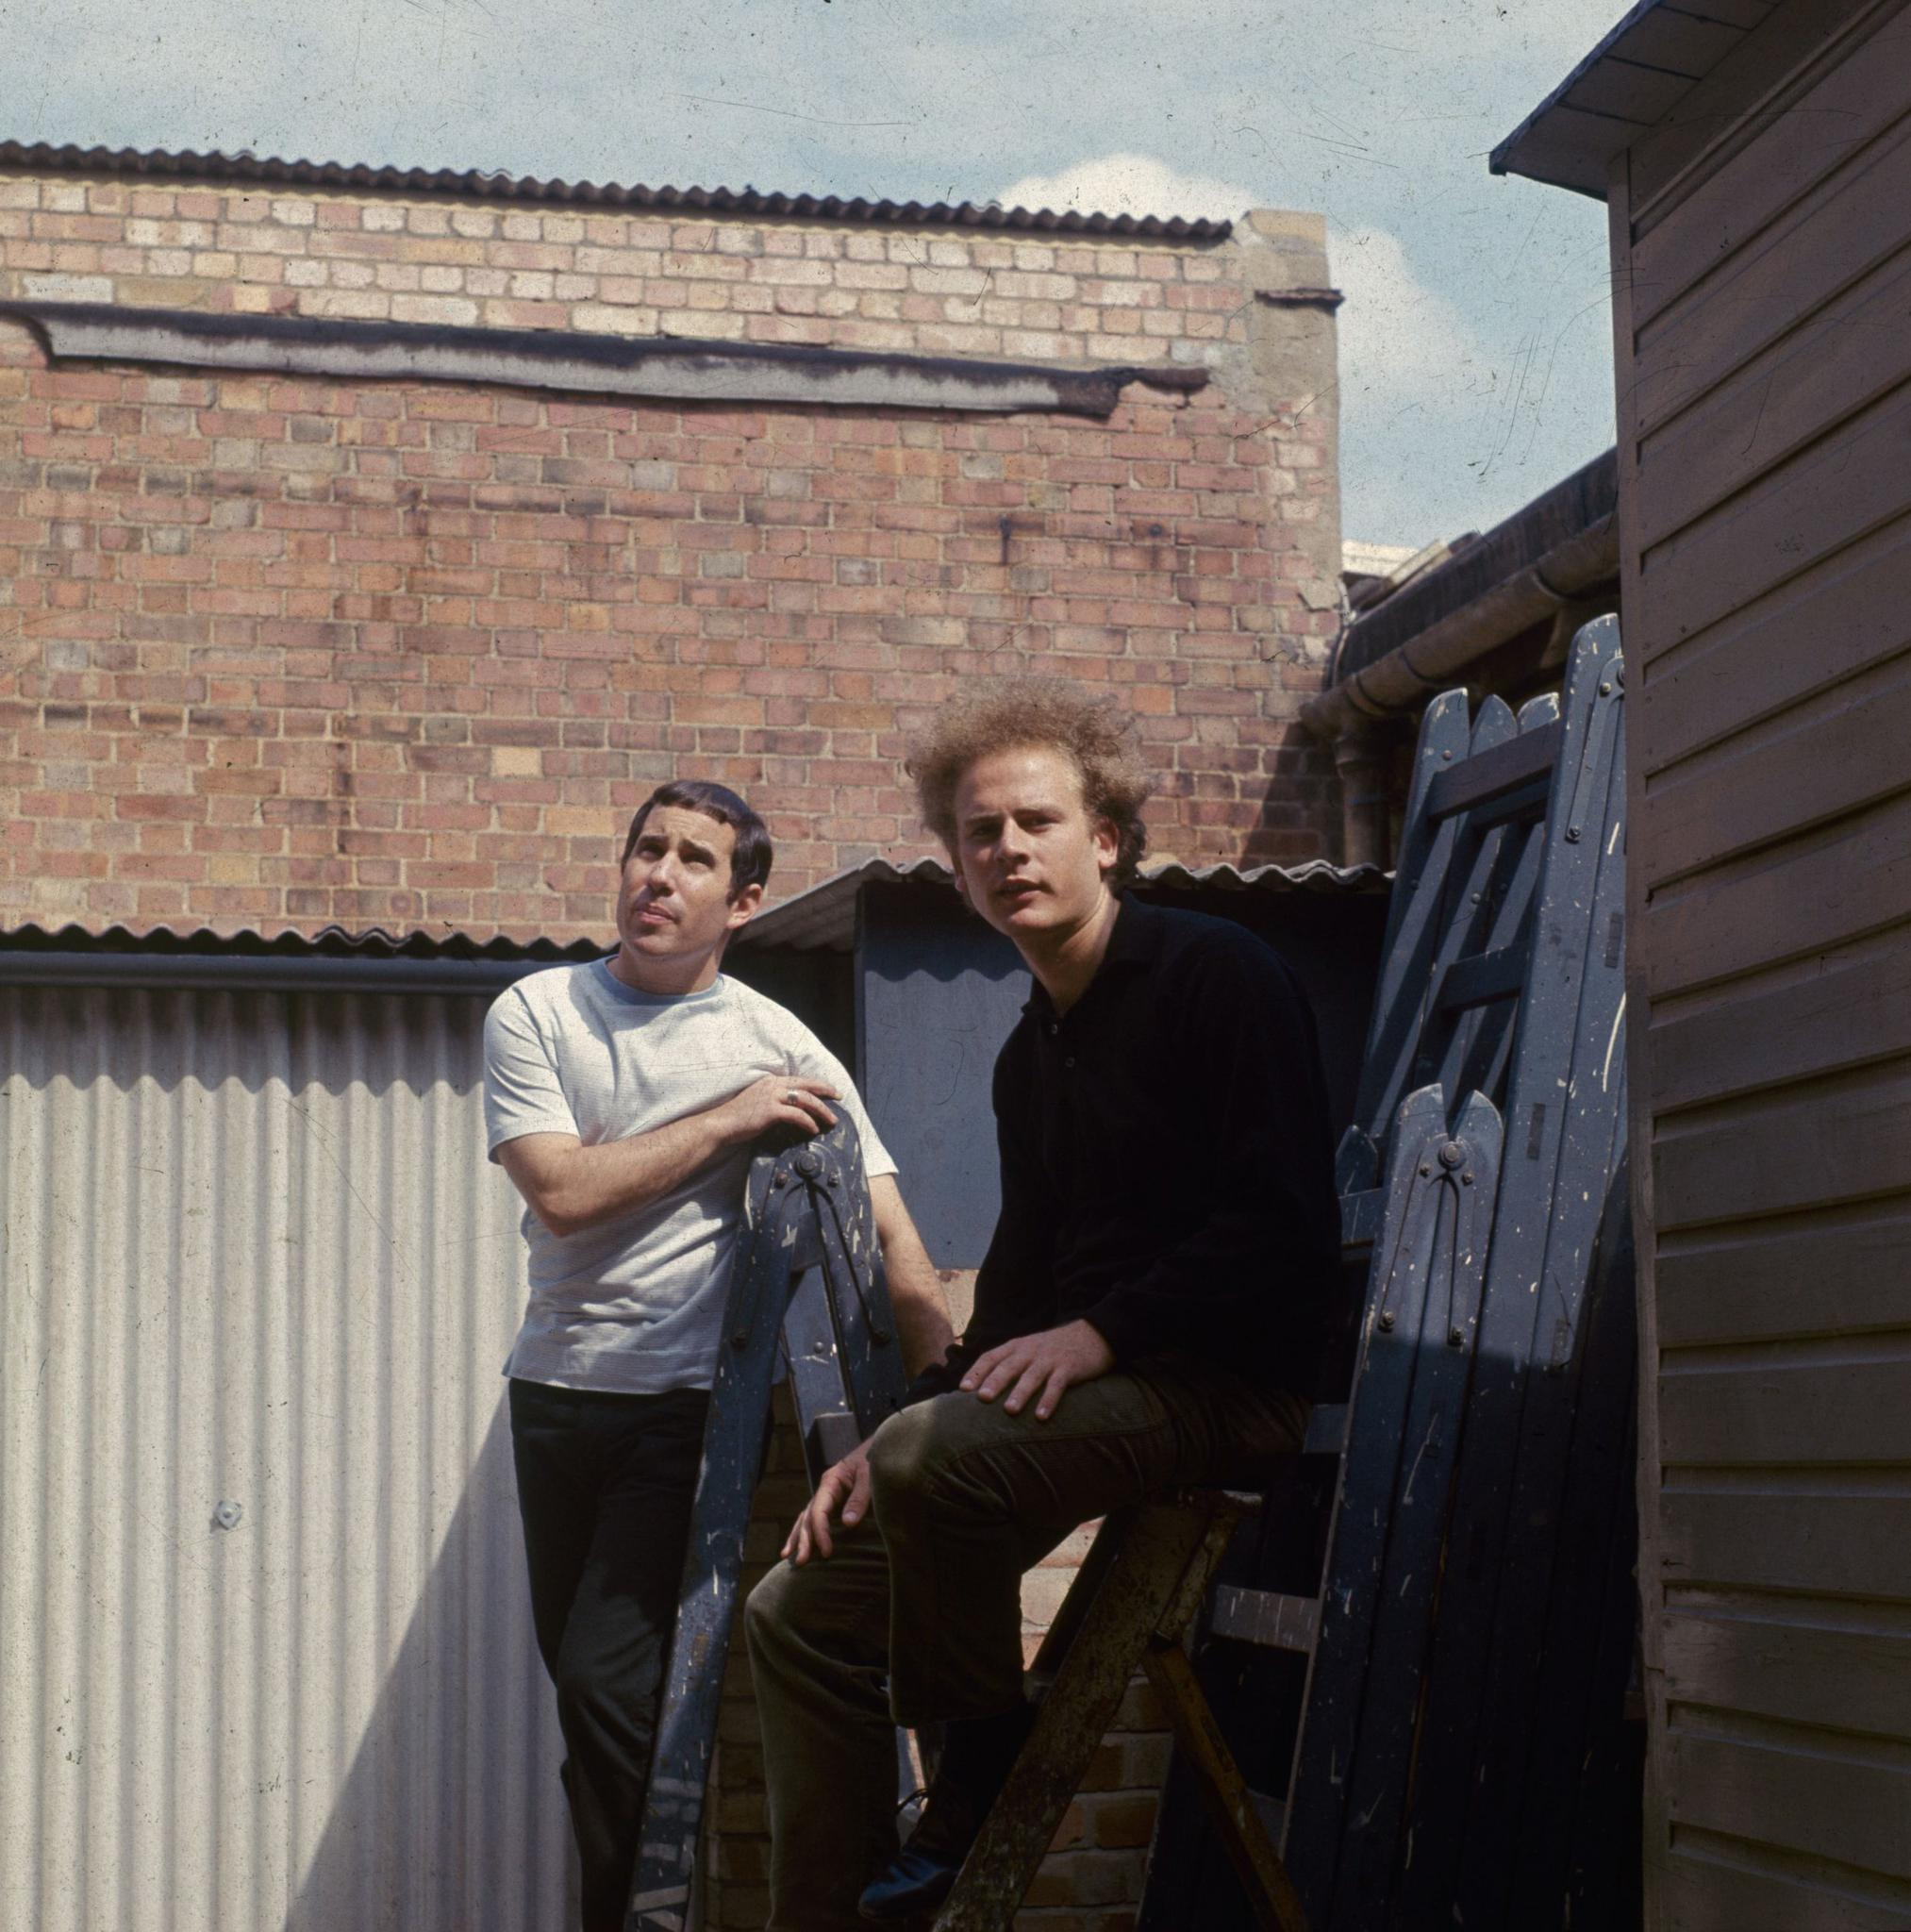 Simon and his childhood buddy Garfunkel, right, were originally defiant East Village folkies.